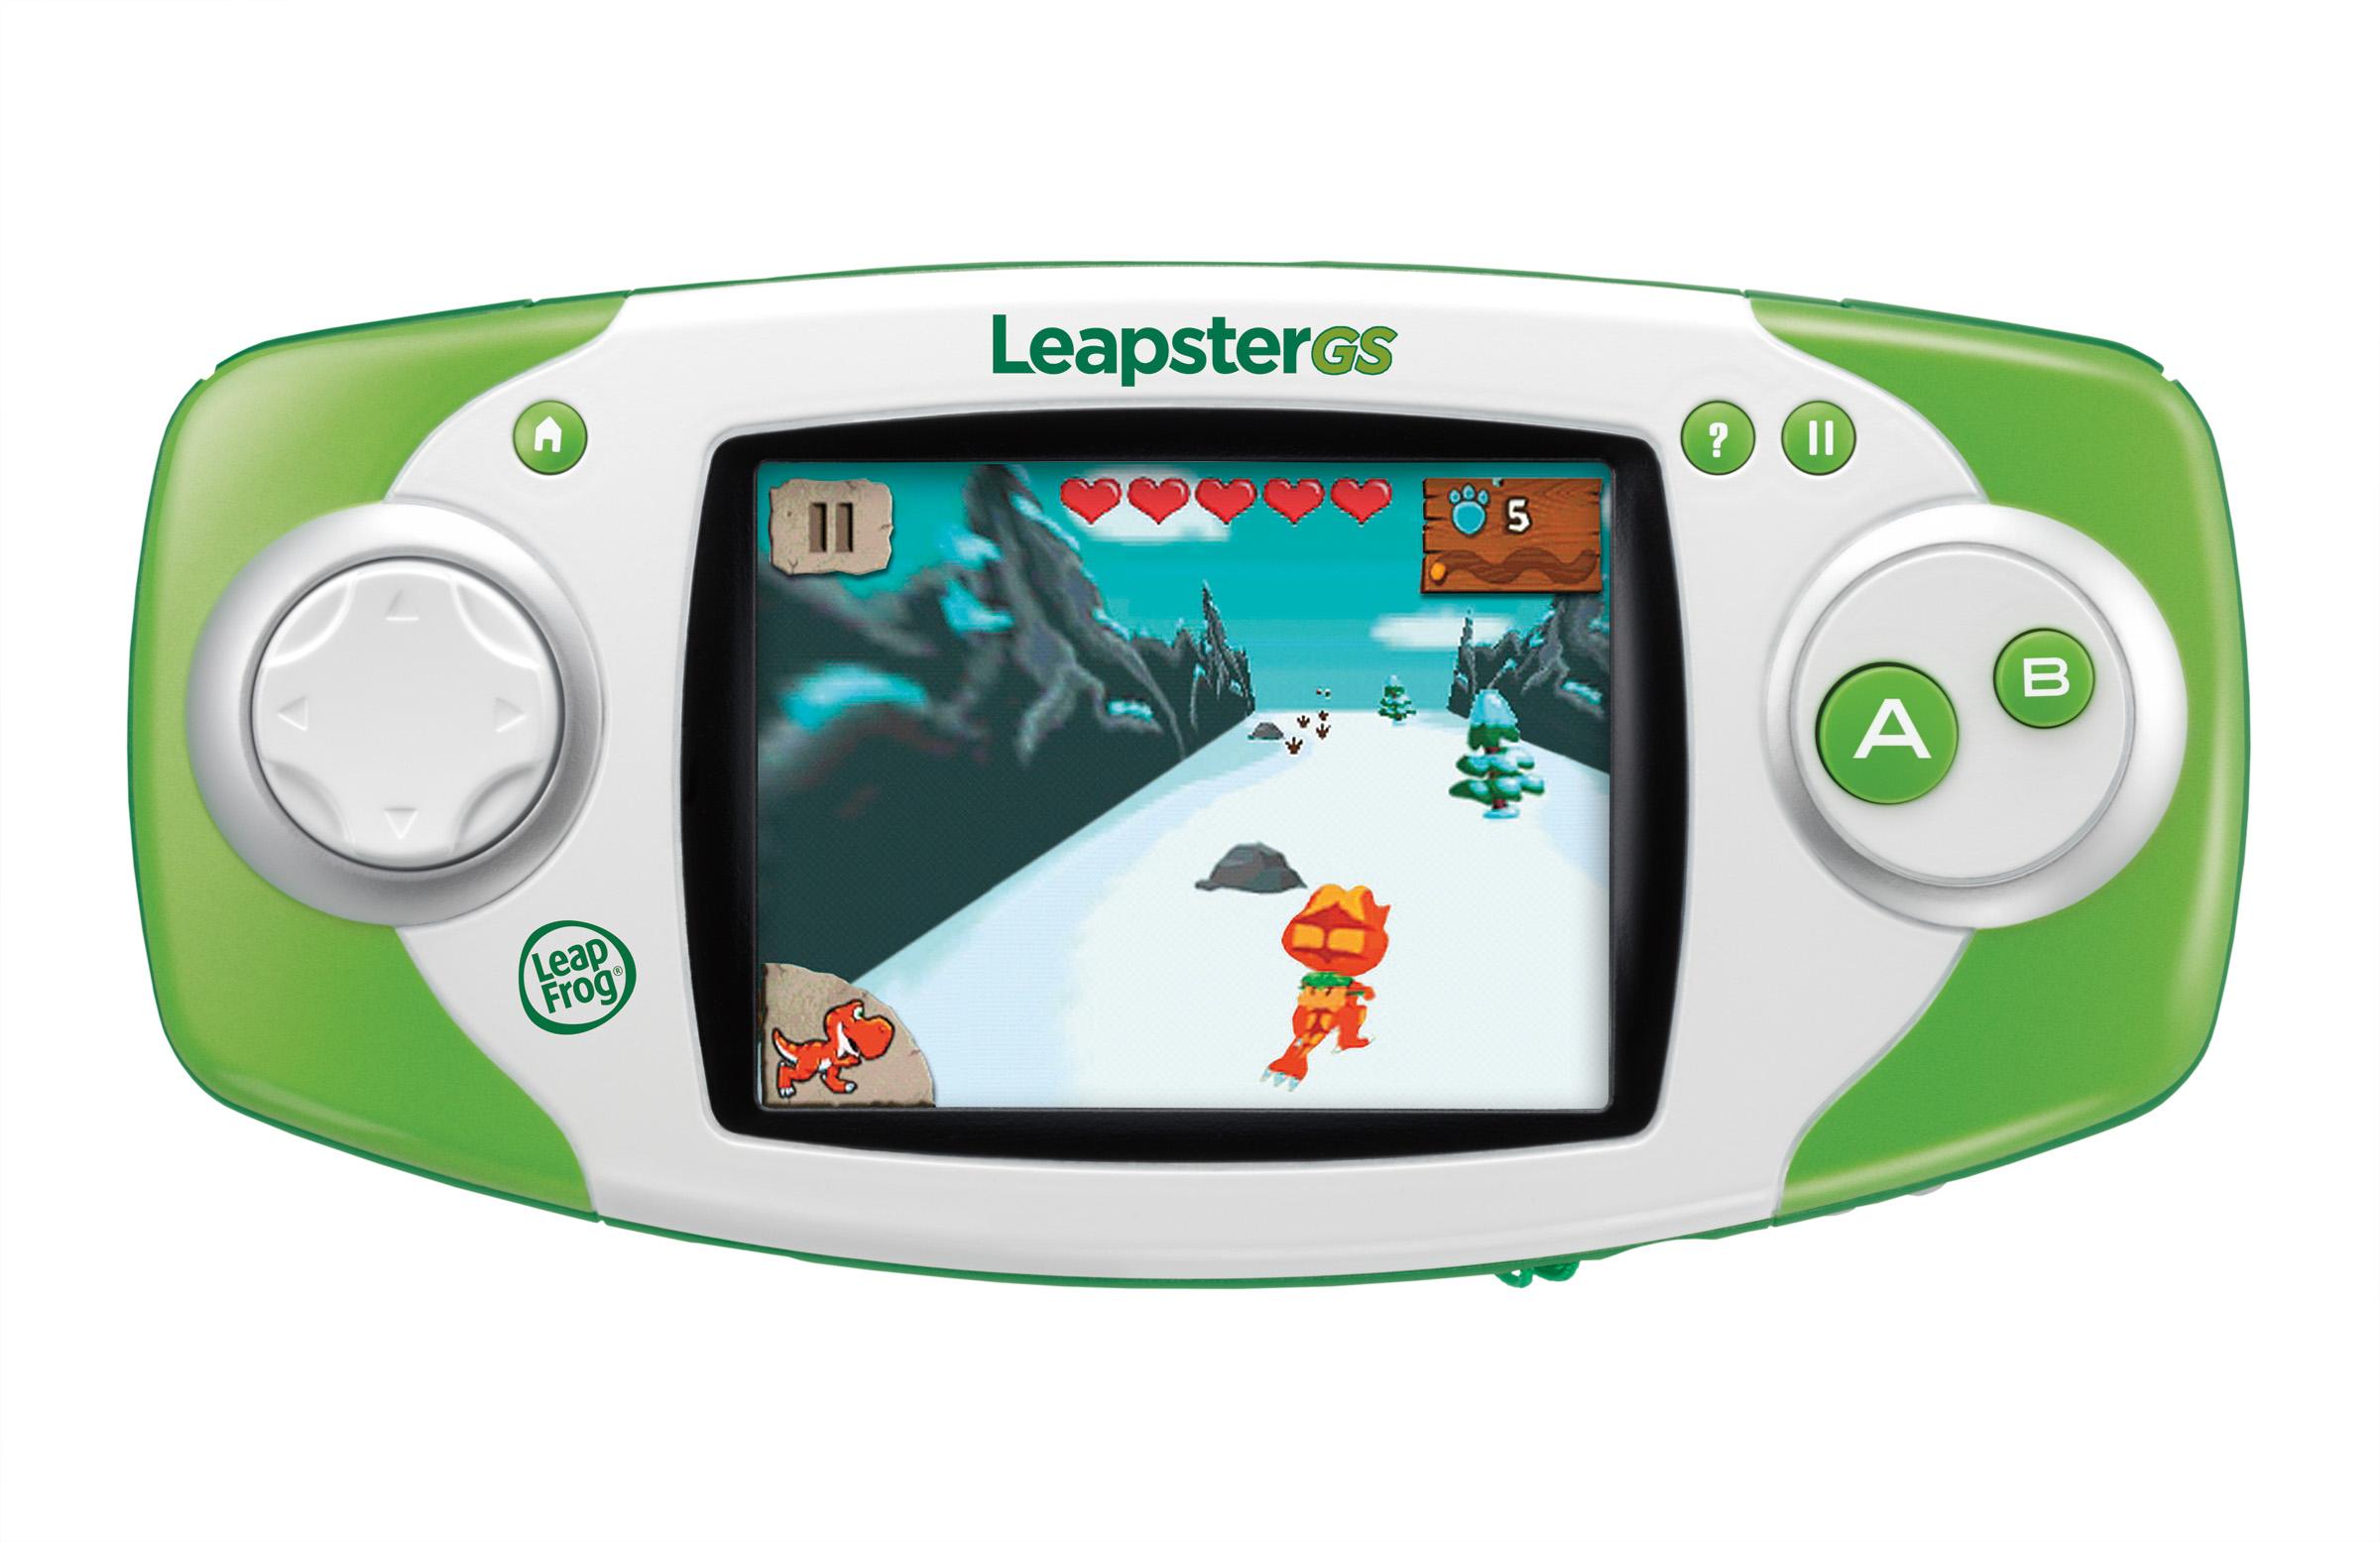 39700_LeapsterGS_PR02